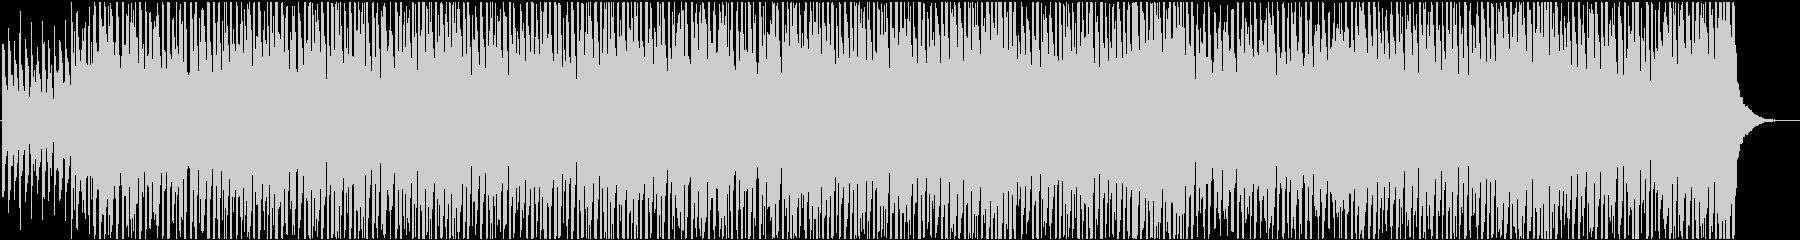 News5 24bit44kHzVerの未再生の波形